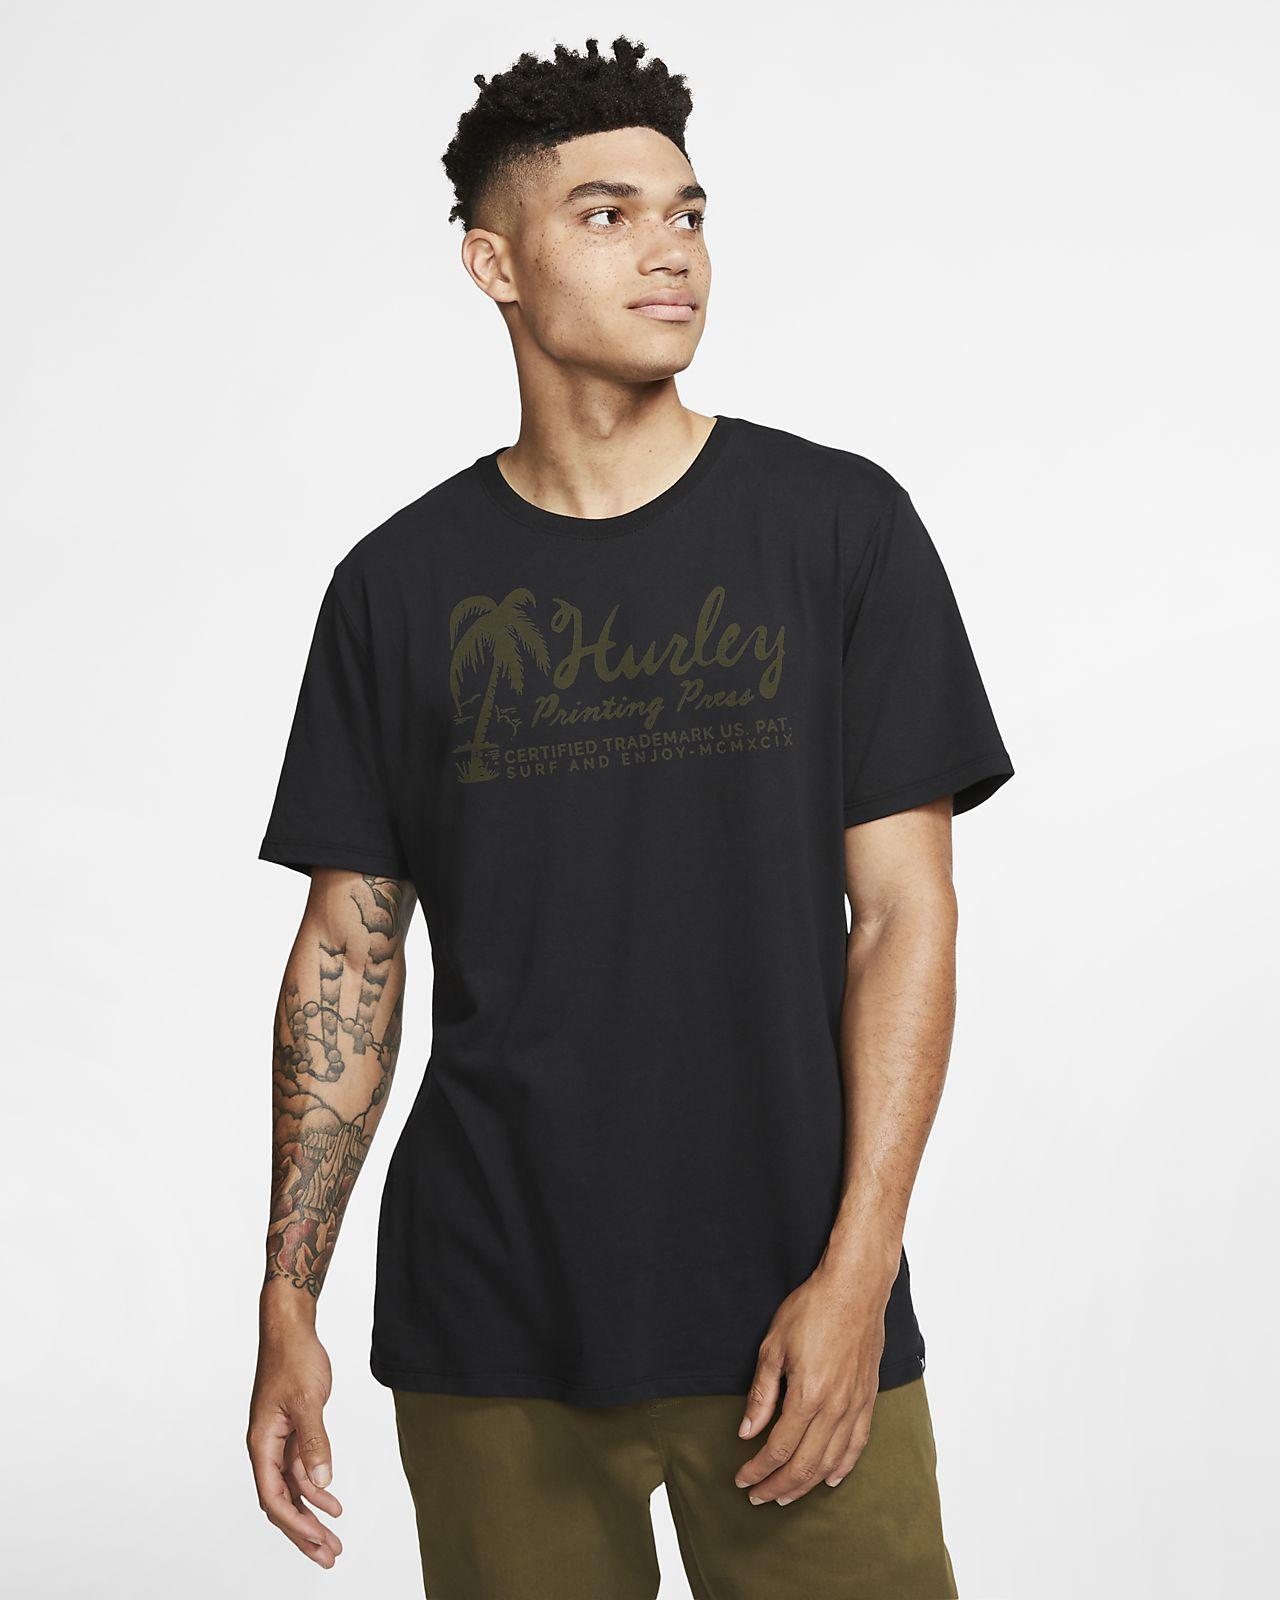 T-shirt Premium Fit Hurley Dri-FIT Surf Imports - Uomo